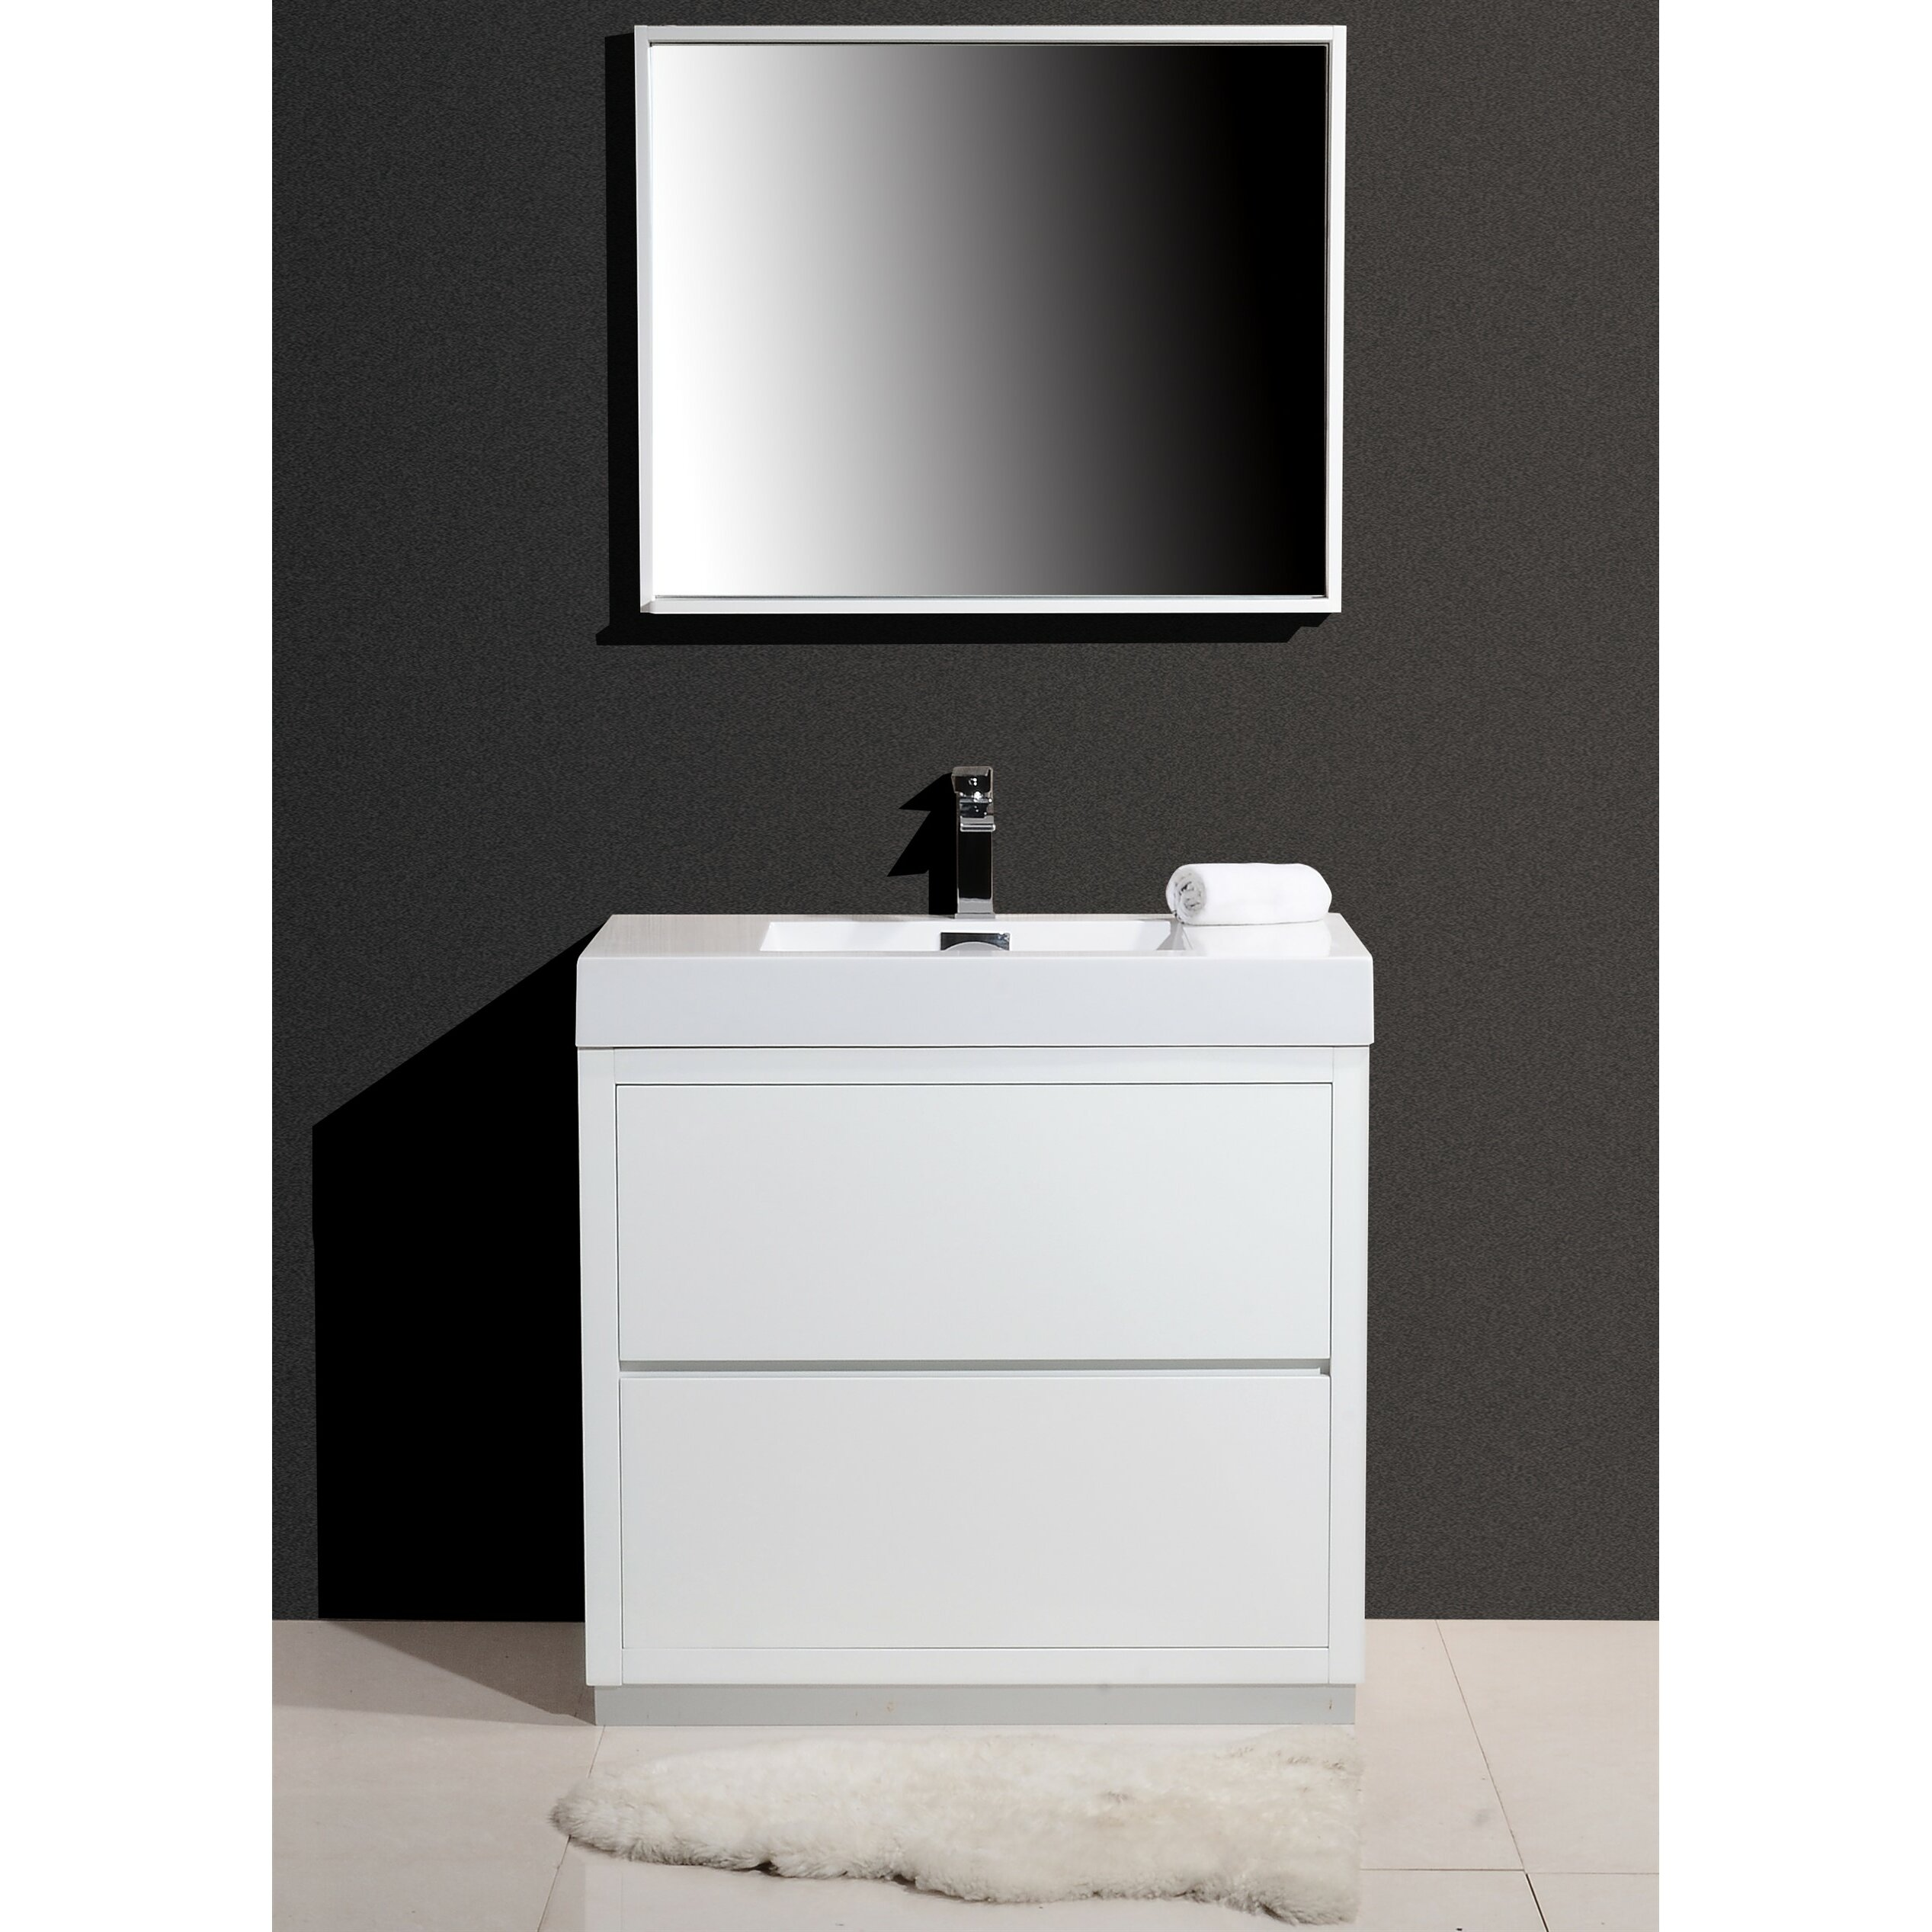 bliss 36 single free standing modern bathroom vanity set wayfair. Black Bedroom Furniture Sets. Home Design Ideas